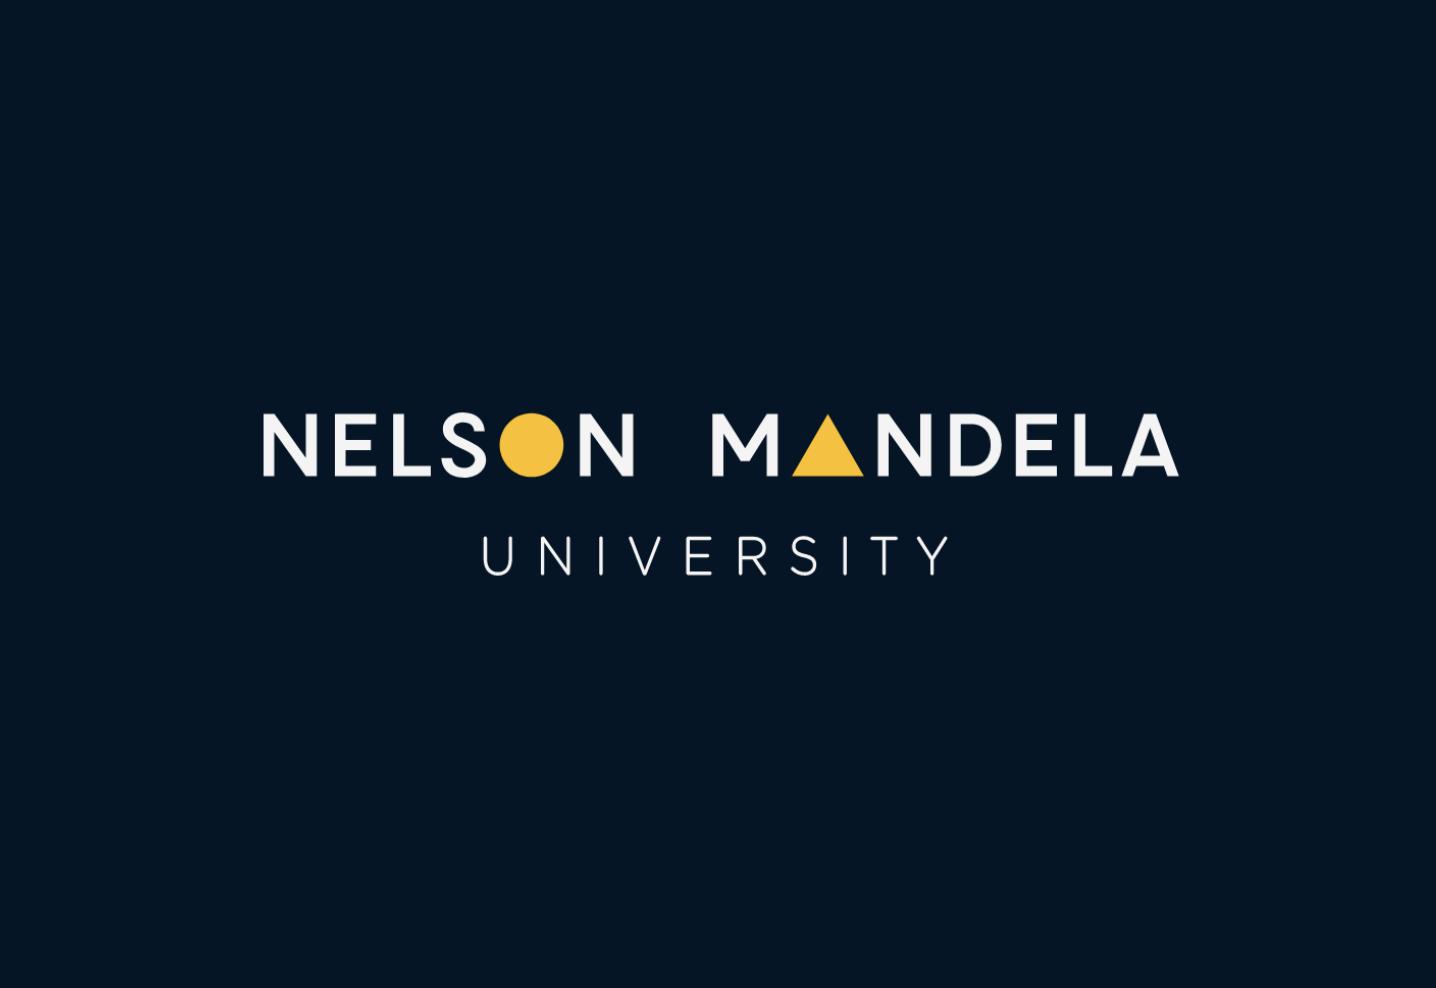 Creative Design Company - client Nelson Mandela University stacked logo